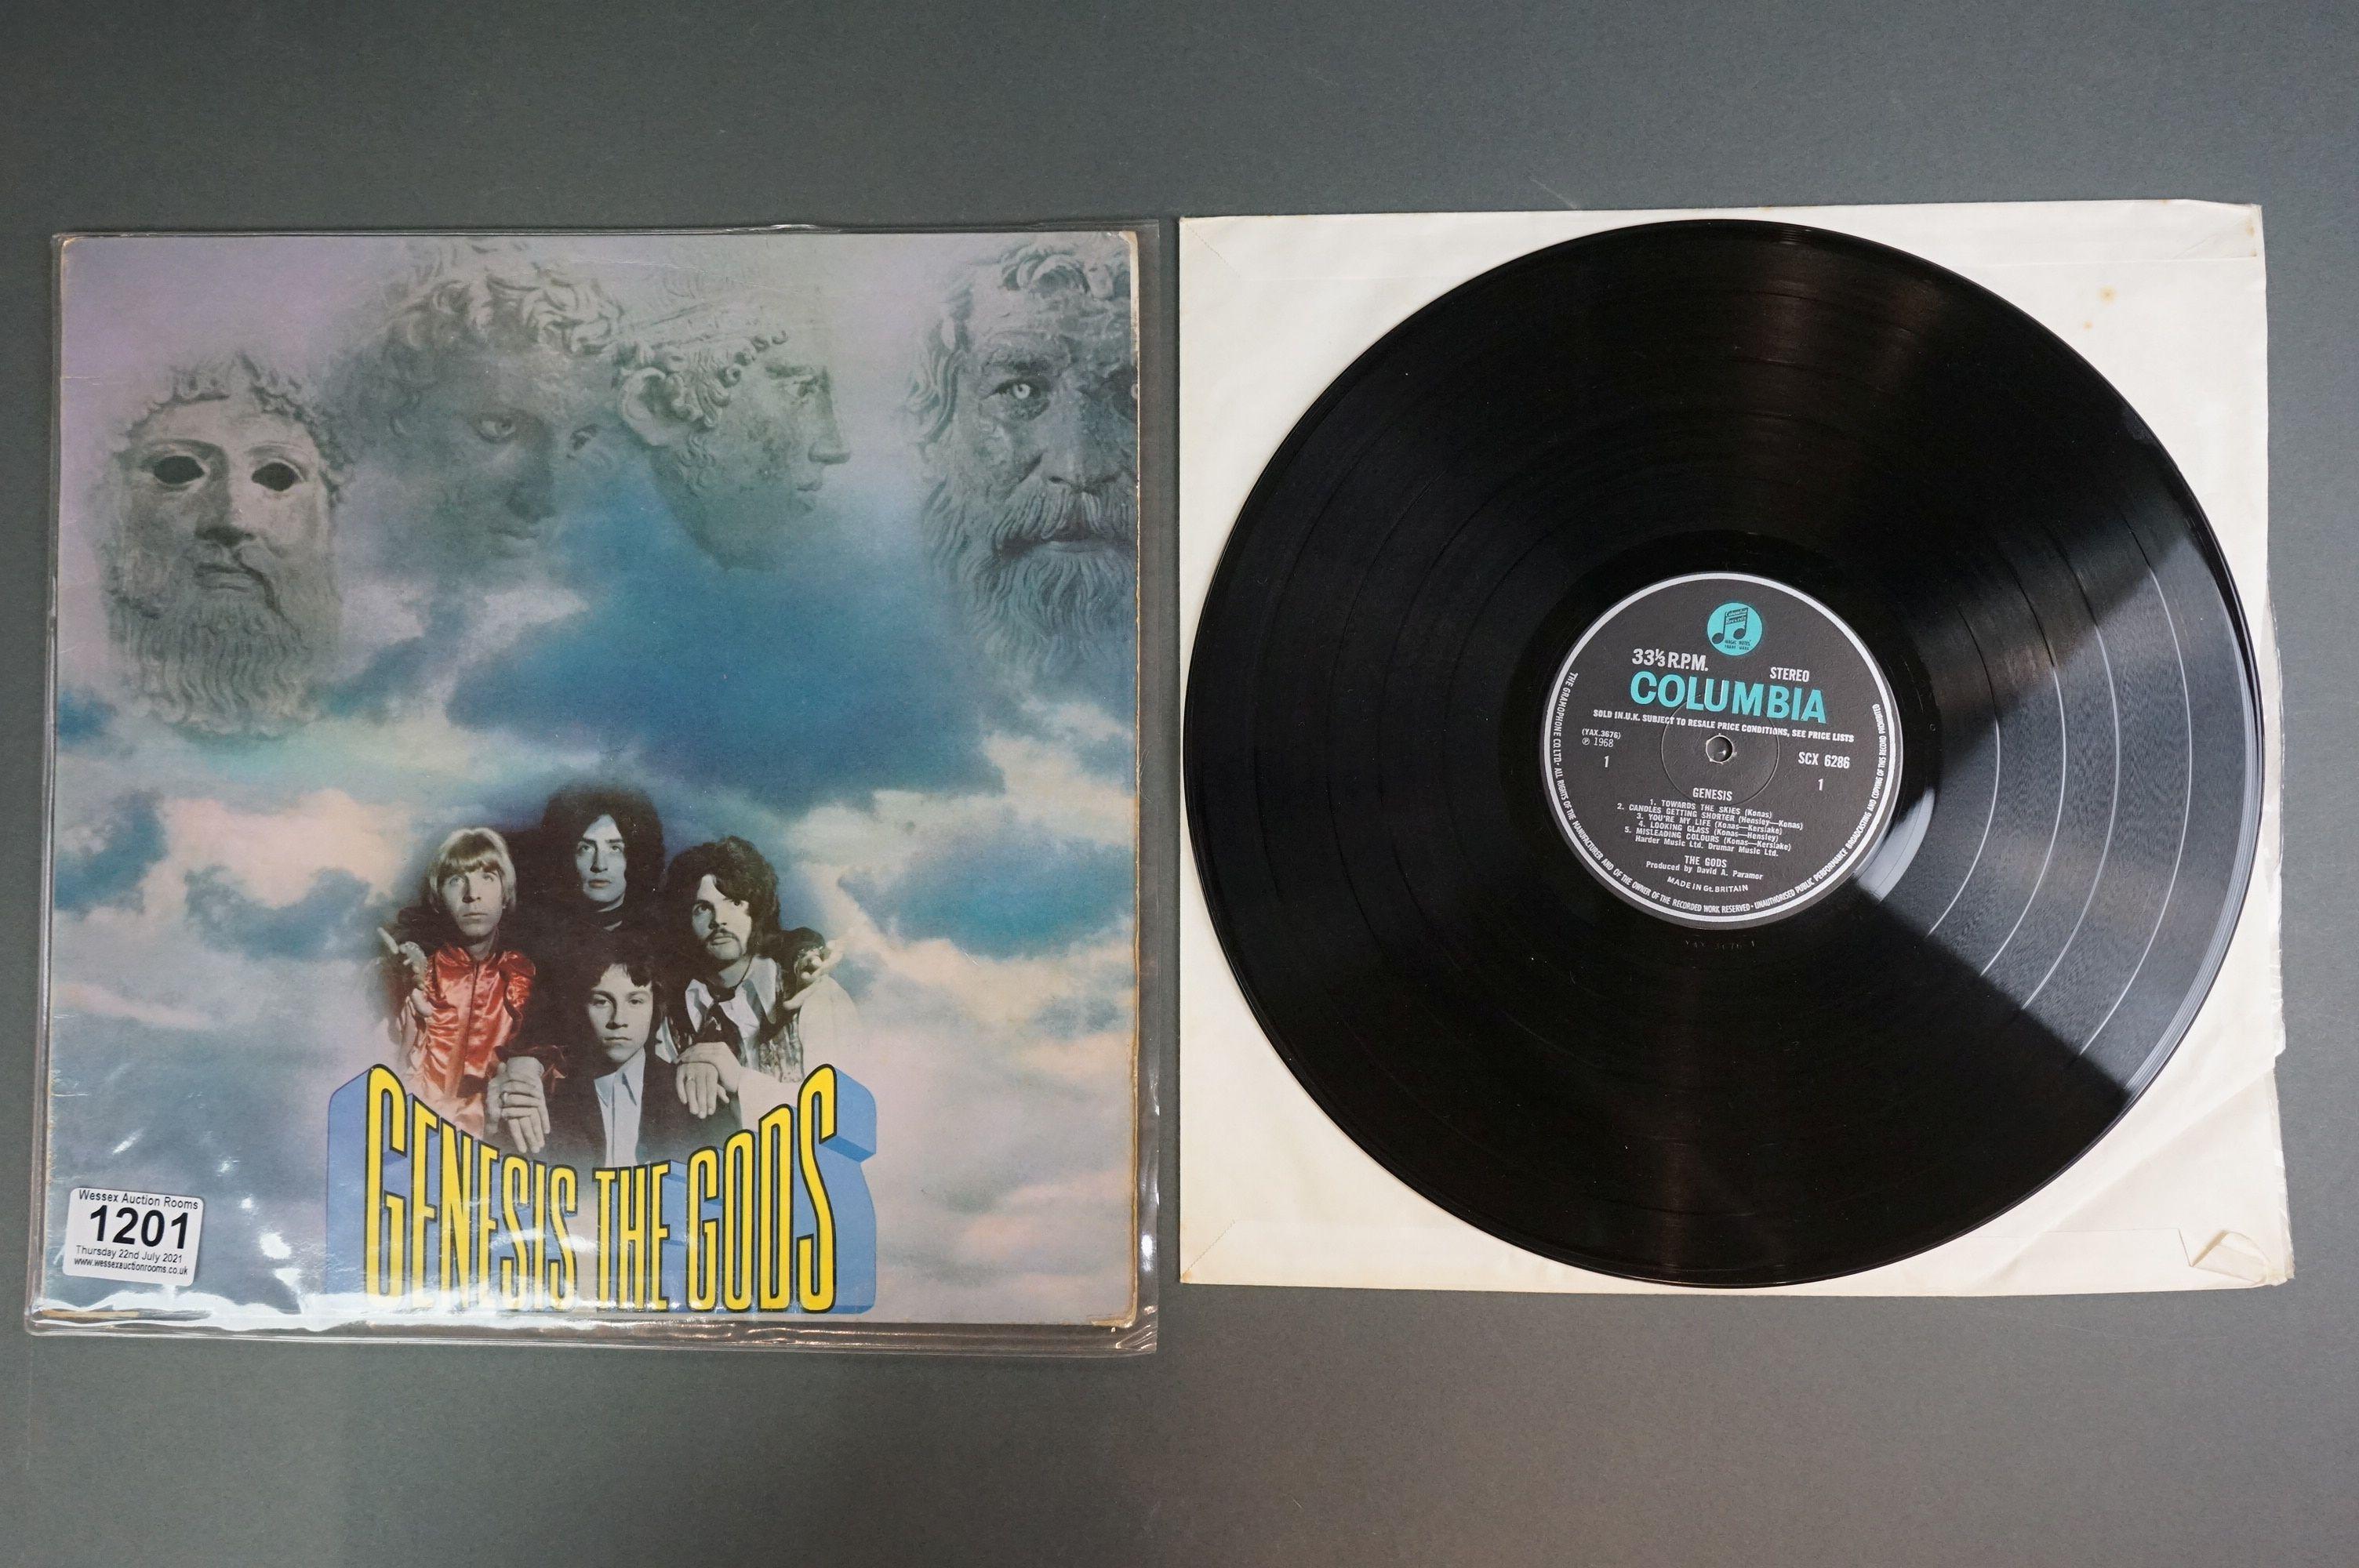 Vinyl - The Gods - Genesis LP SCX6286 sold in UK to label, sleeve and vinyl vg+ - Image 2 of 3